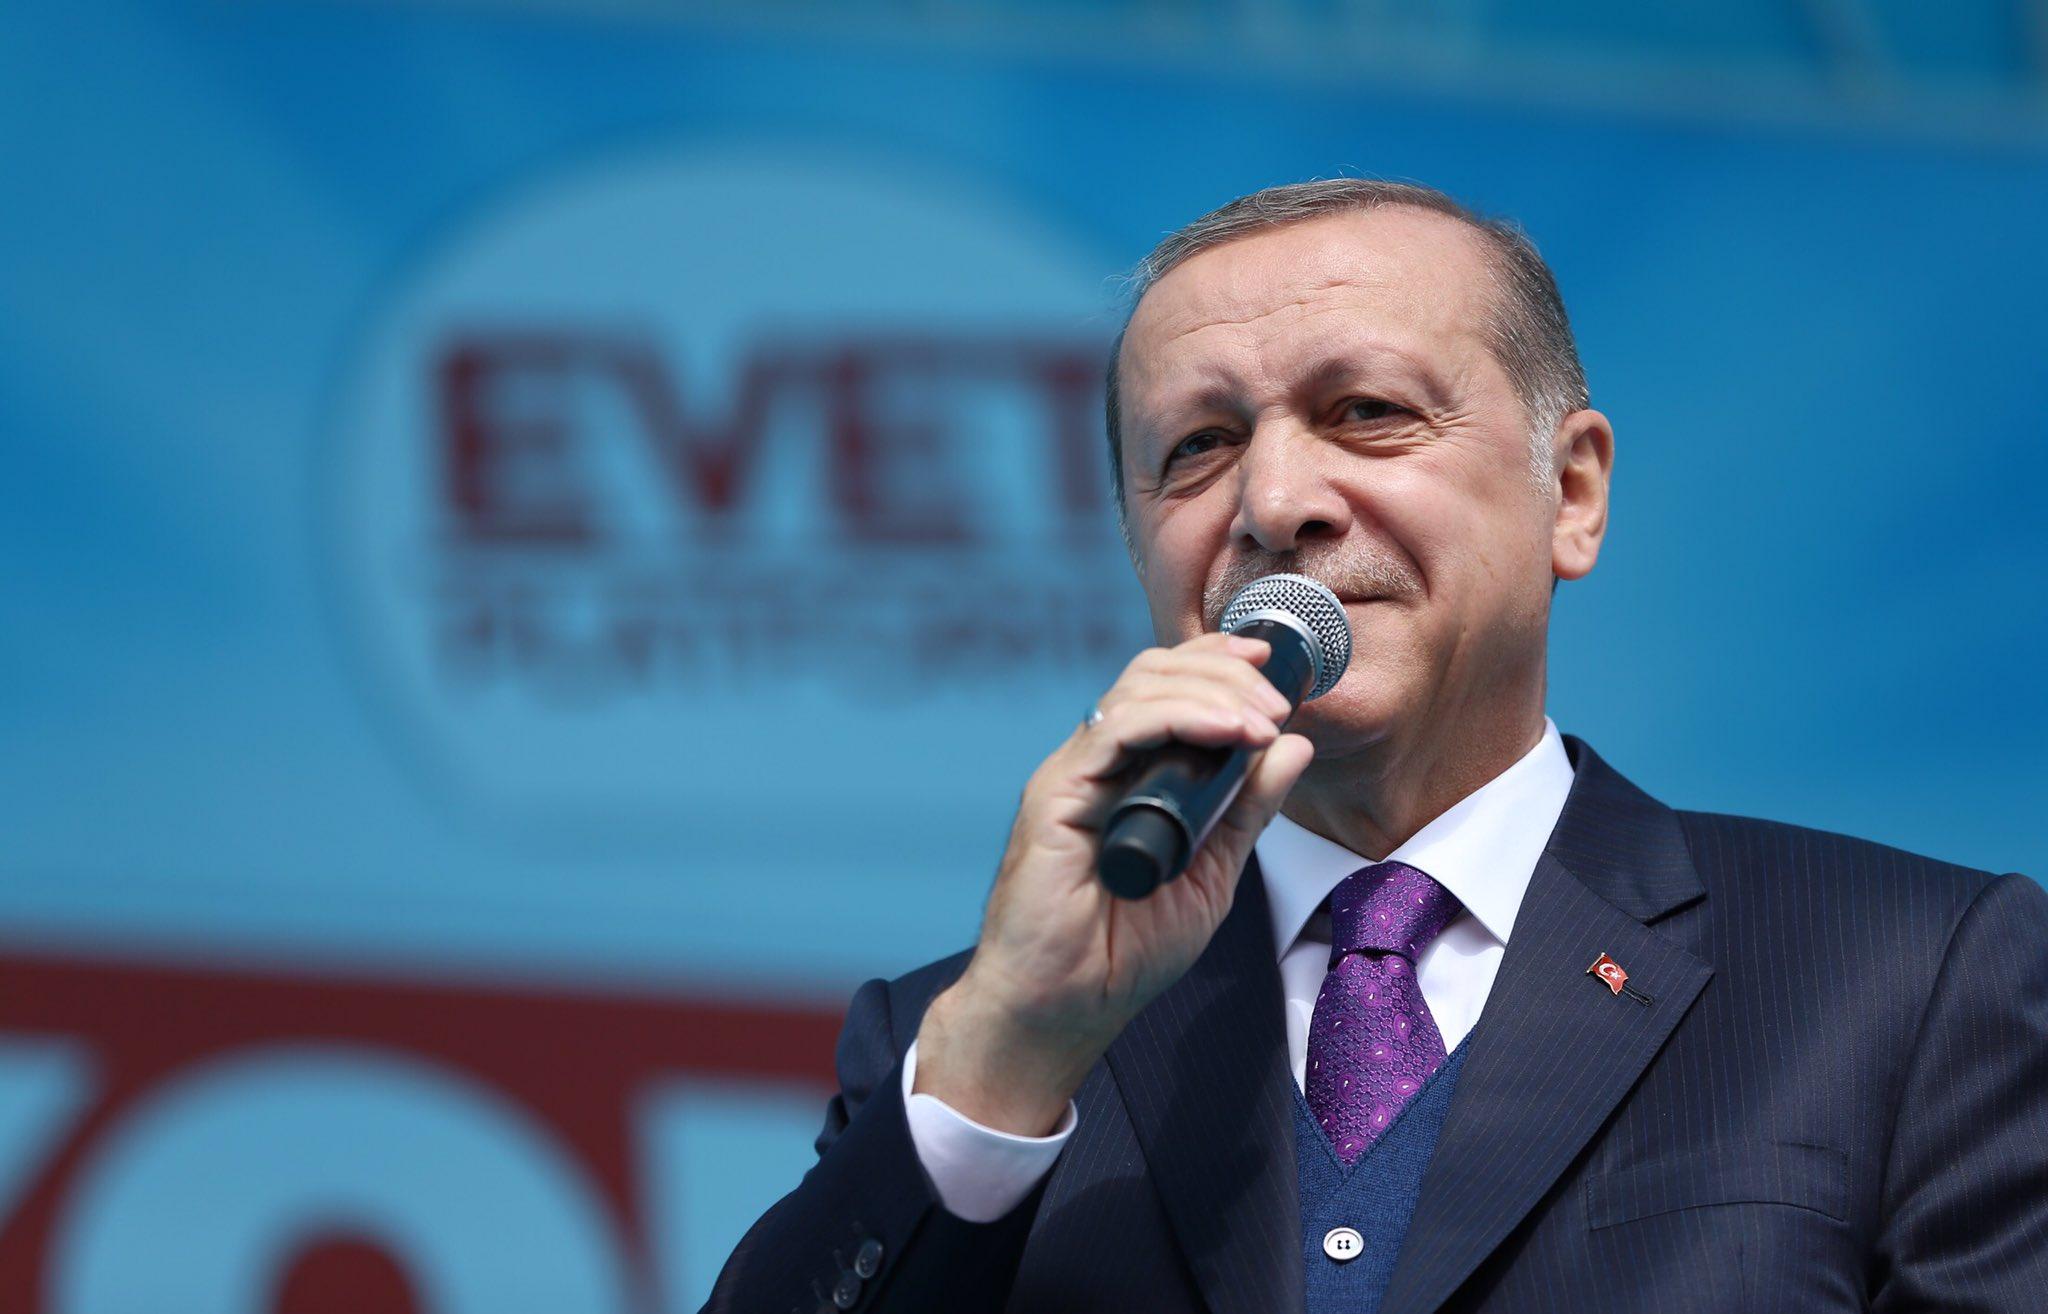 Teşekkürler Konya! https://t.co/D6mG9hC8zX